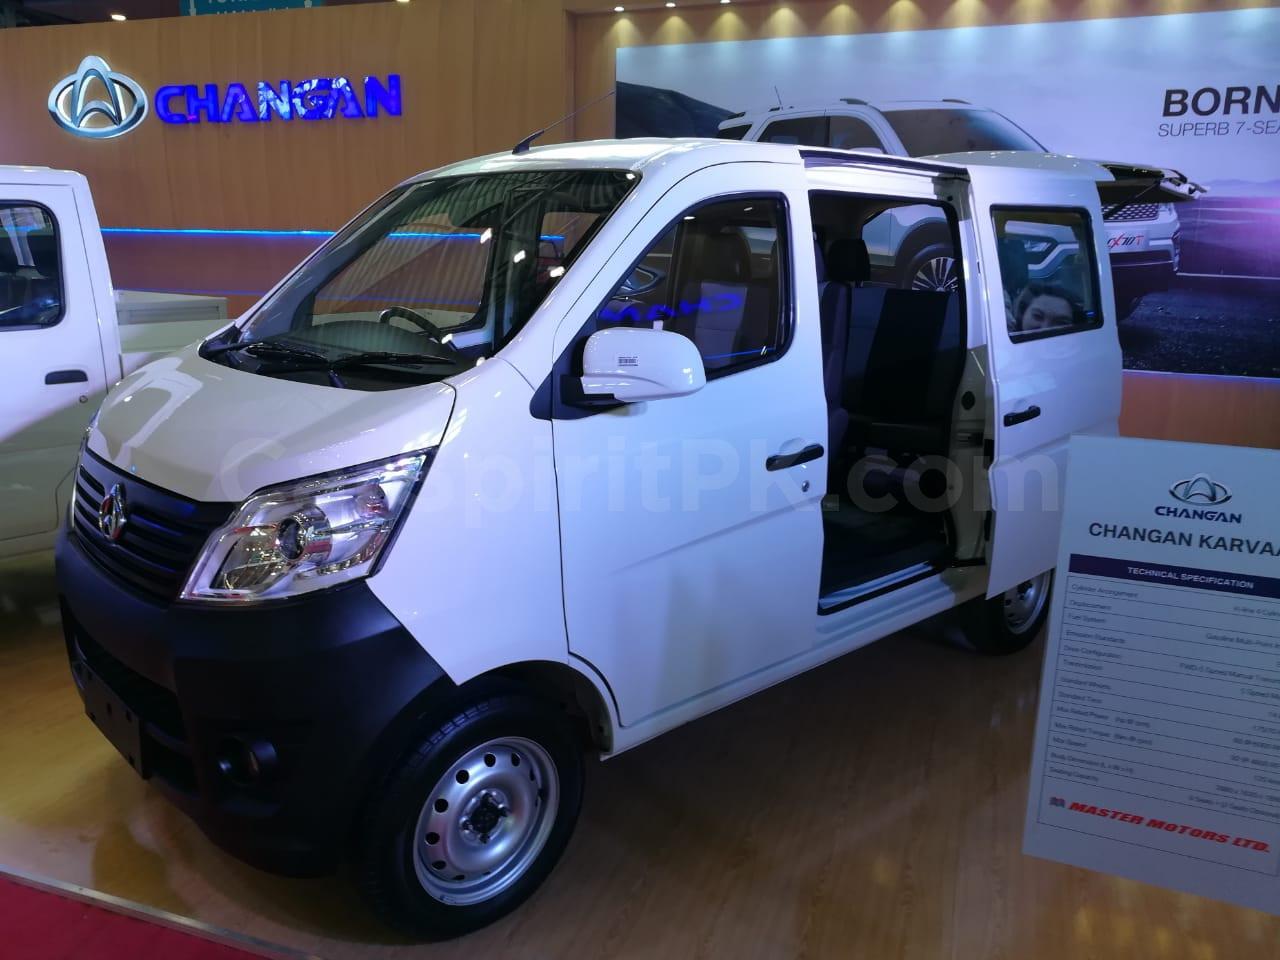 Changan Launches Karvaan Minivan and M-9 Pickup 1